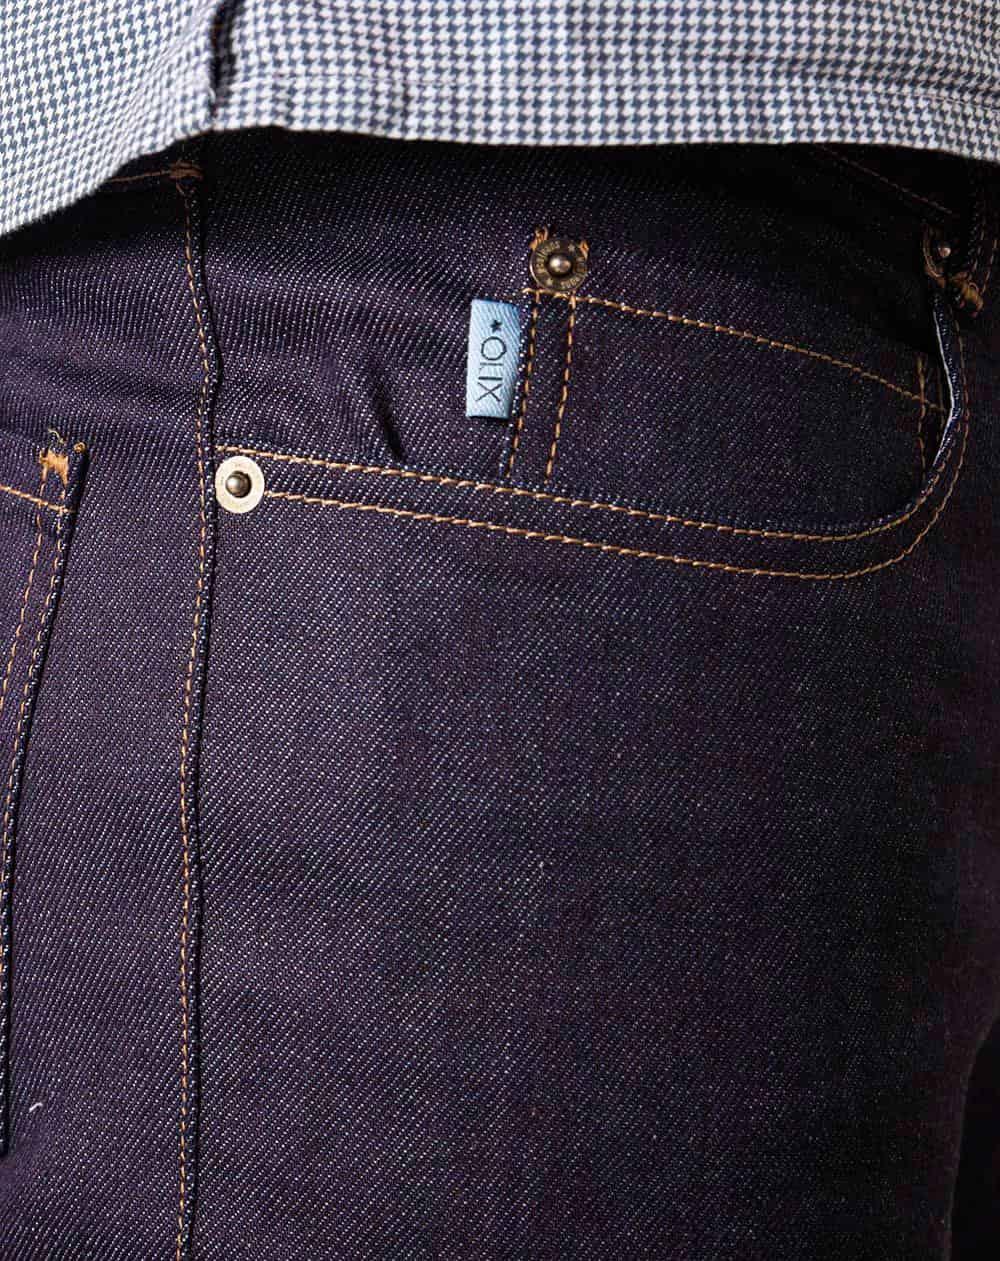 Bolsillo lateral jeans slim fit hombre indigo oscuro ecológicos